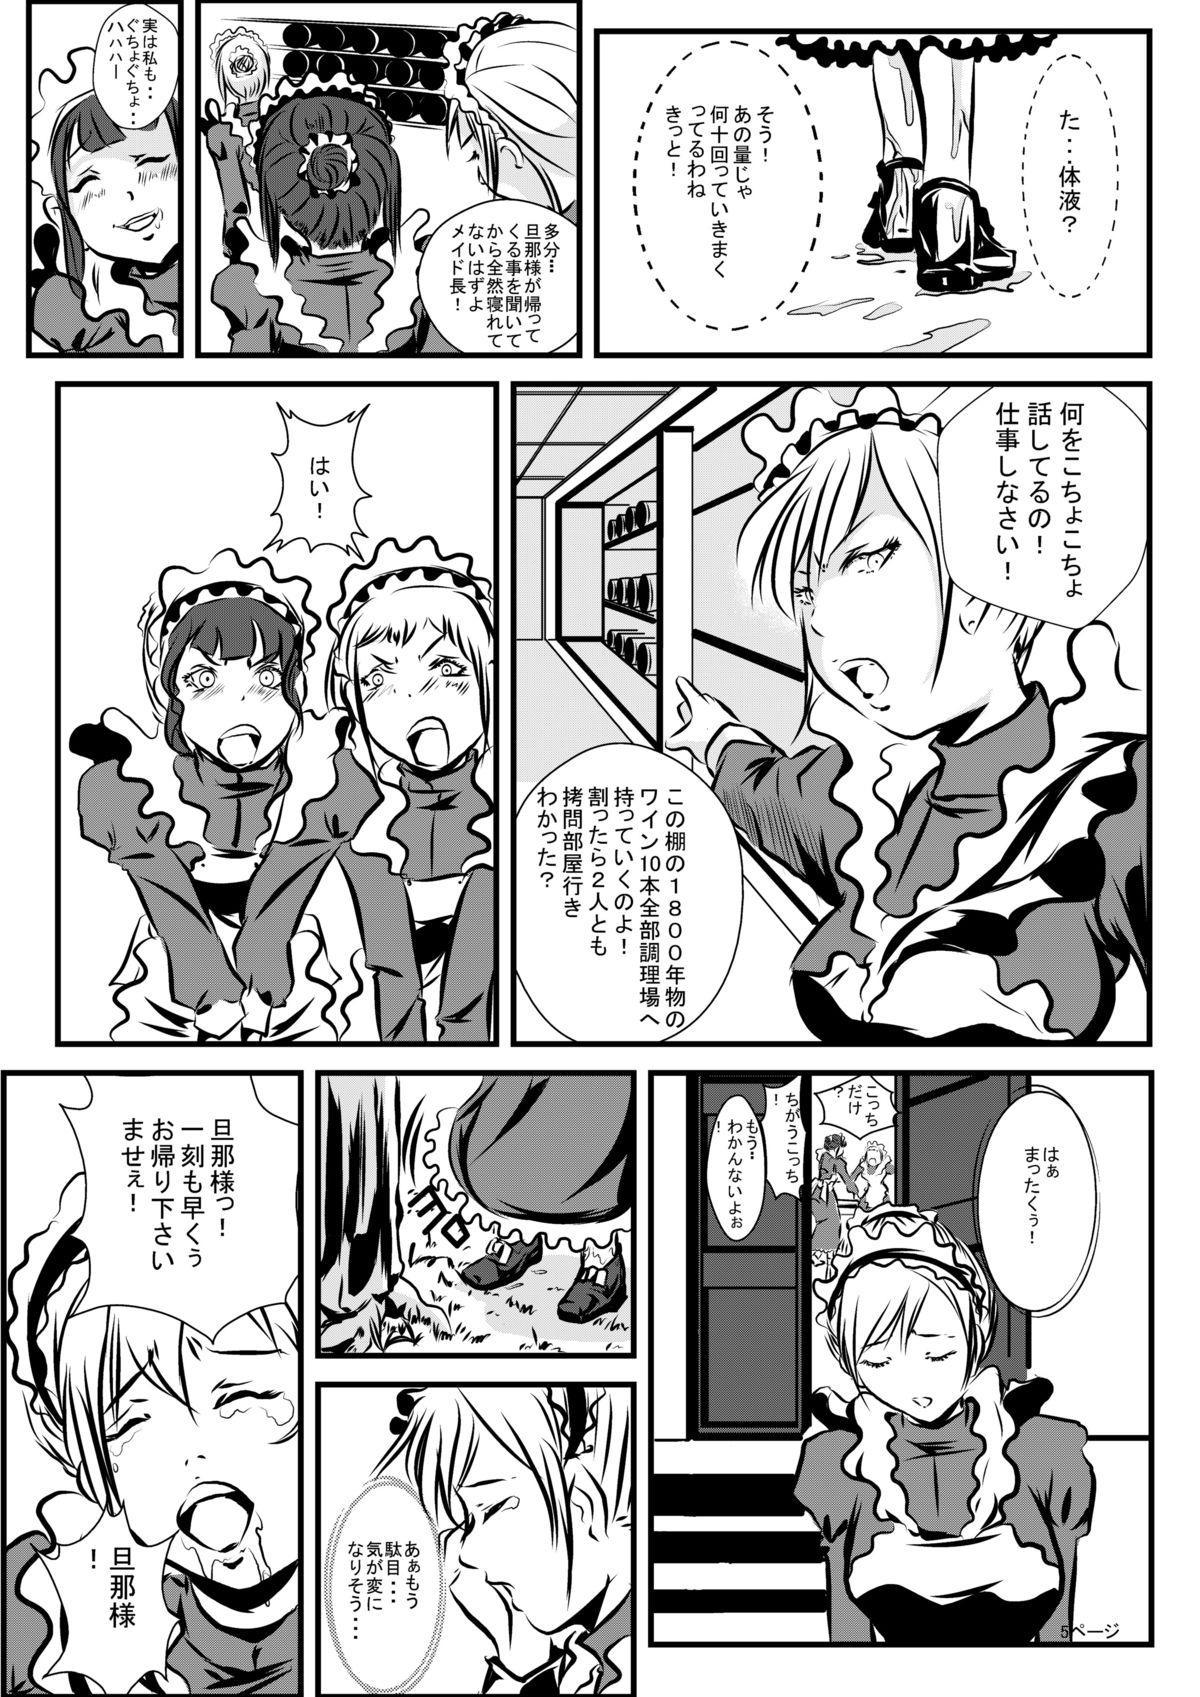 Loli Type no Jikkensitsu 3